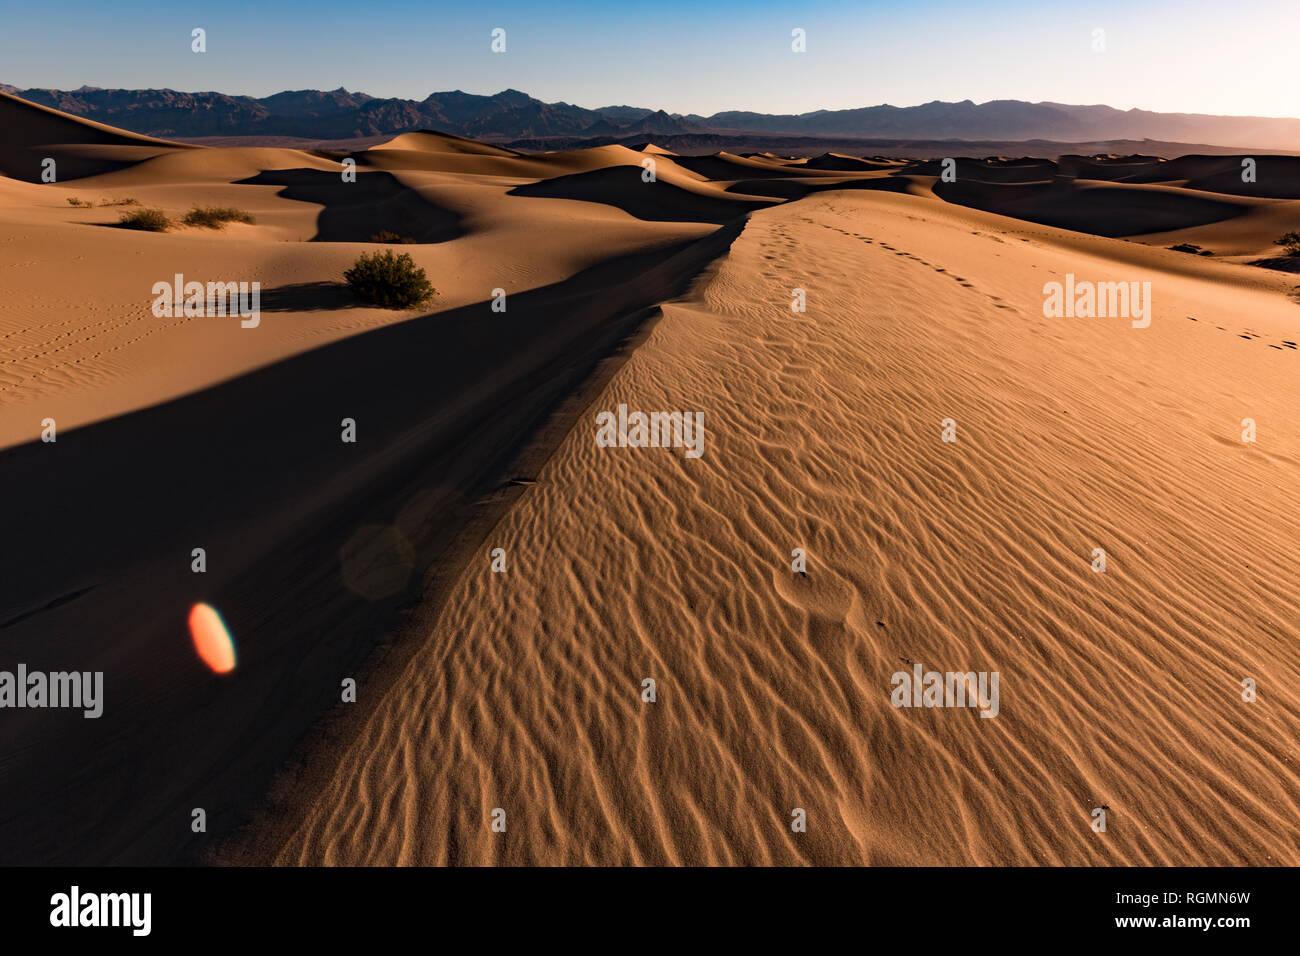 USA, Californien, Death Valley, Death Valley National Park, Mesquite Flat Sand Dunes - Stock Image